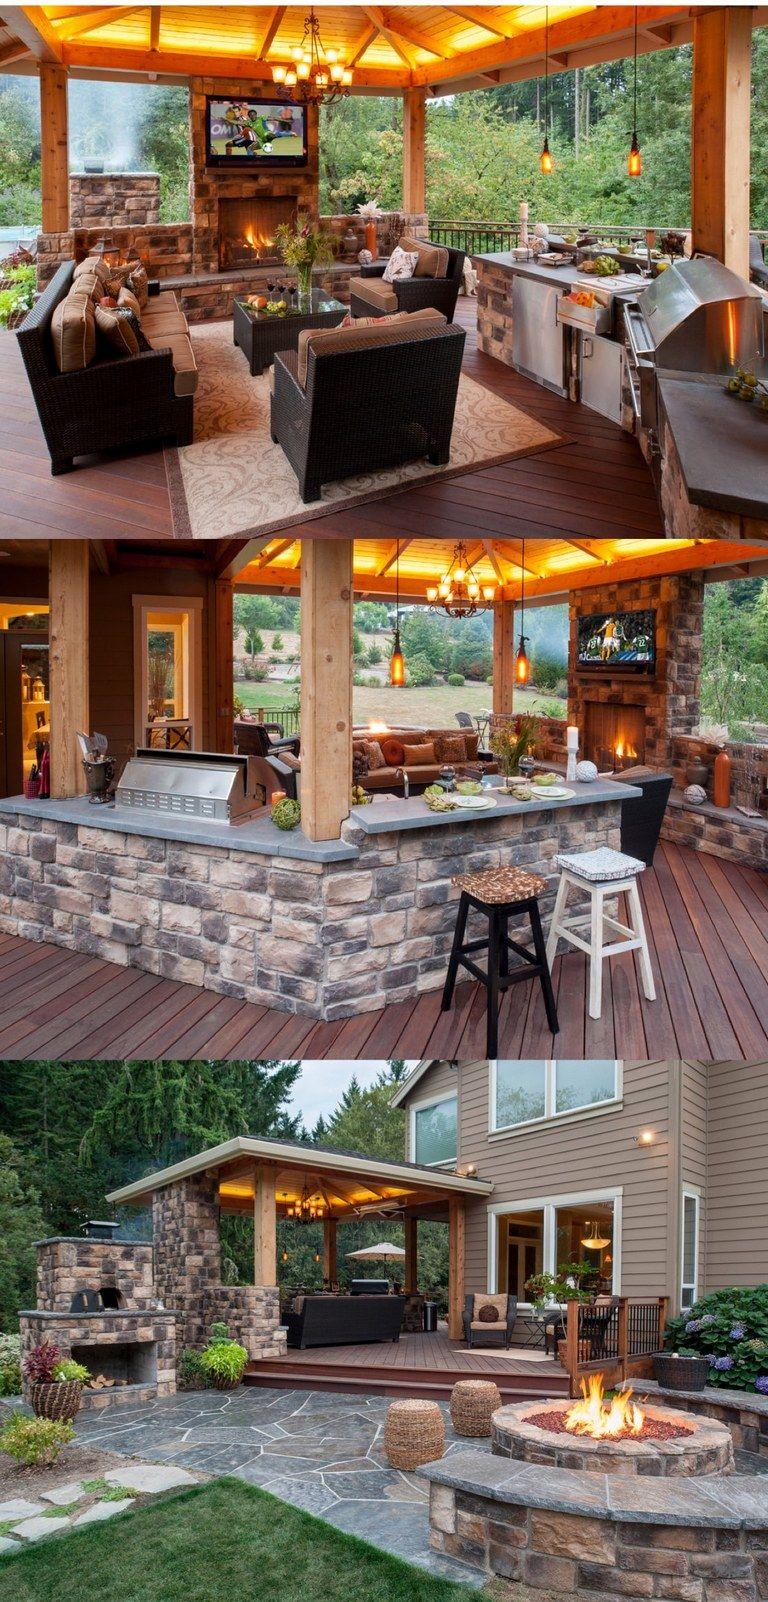 50+ Nice Outdoor Patio Design Ideas